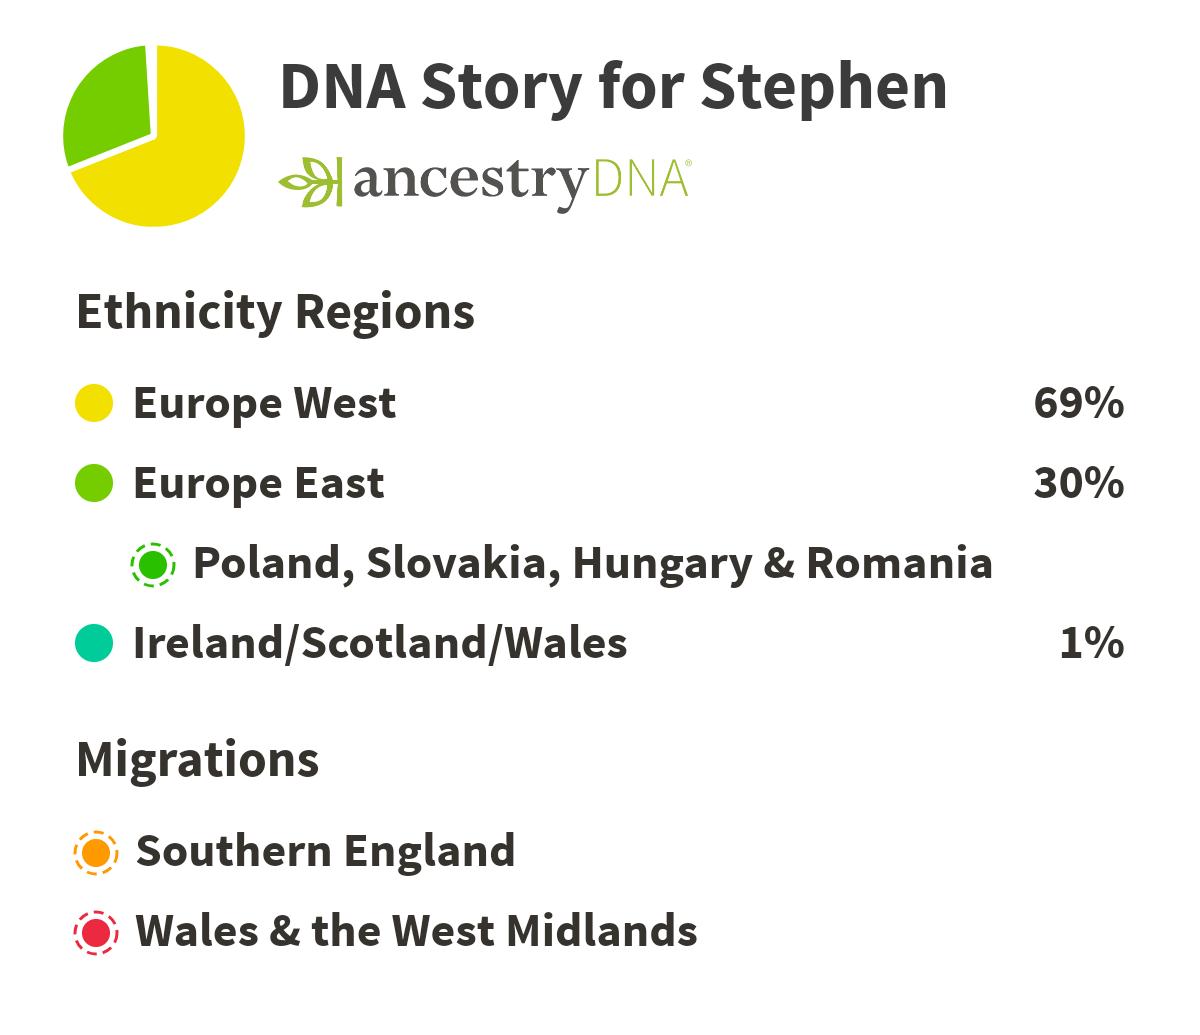 Paternal Ethnicity